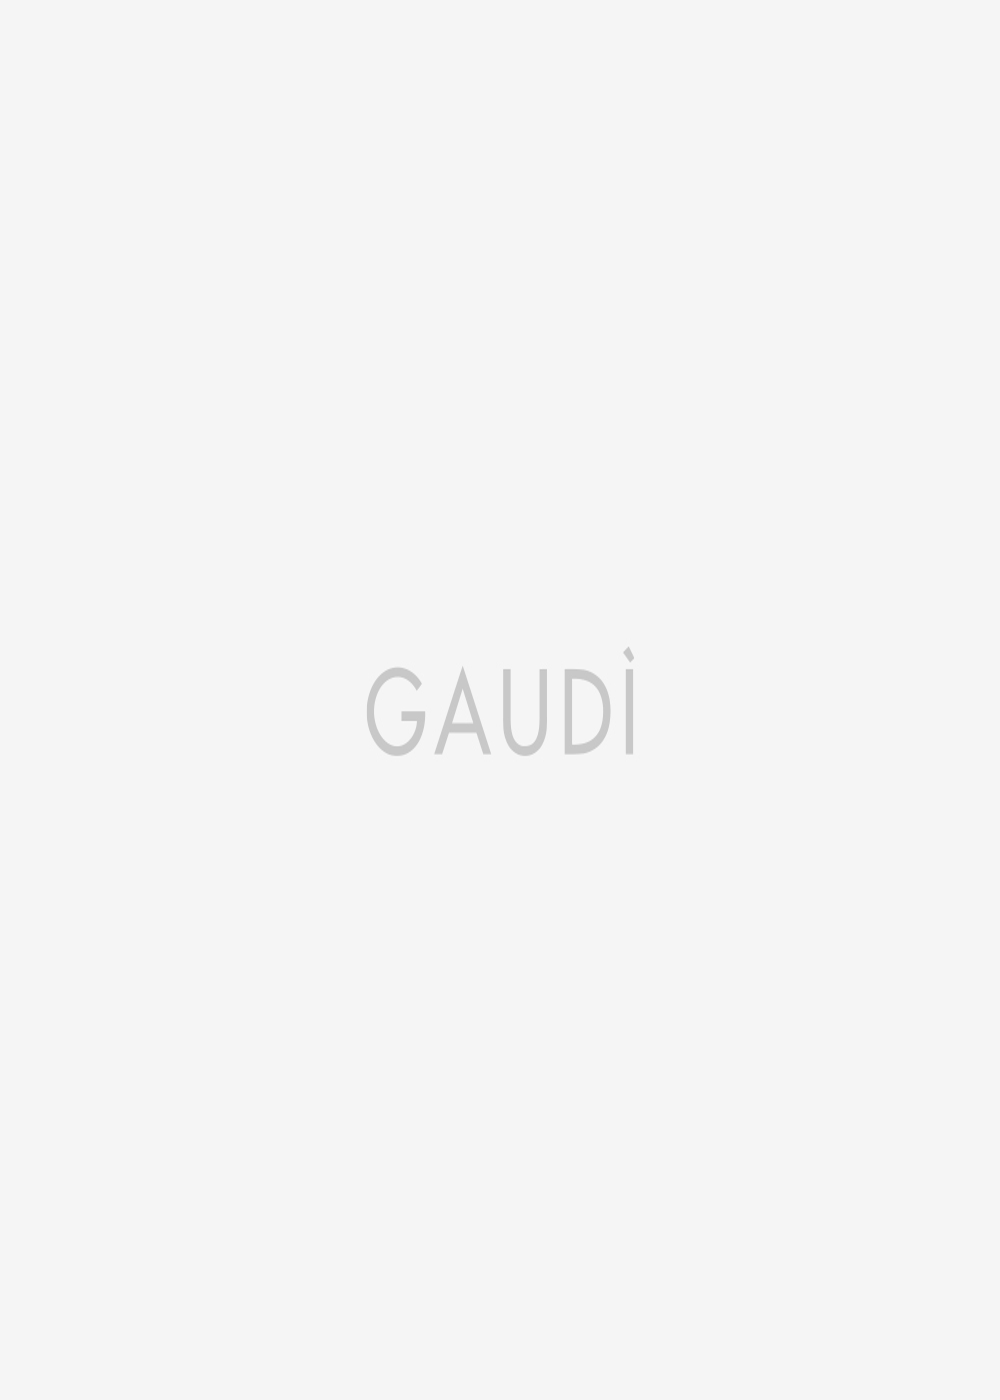 Gaudi Casual Abbigliamento Uomo Online Sportivo E Elegante cwc7FCvq